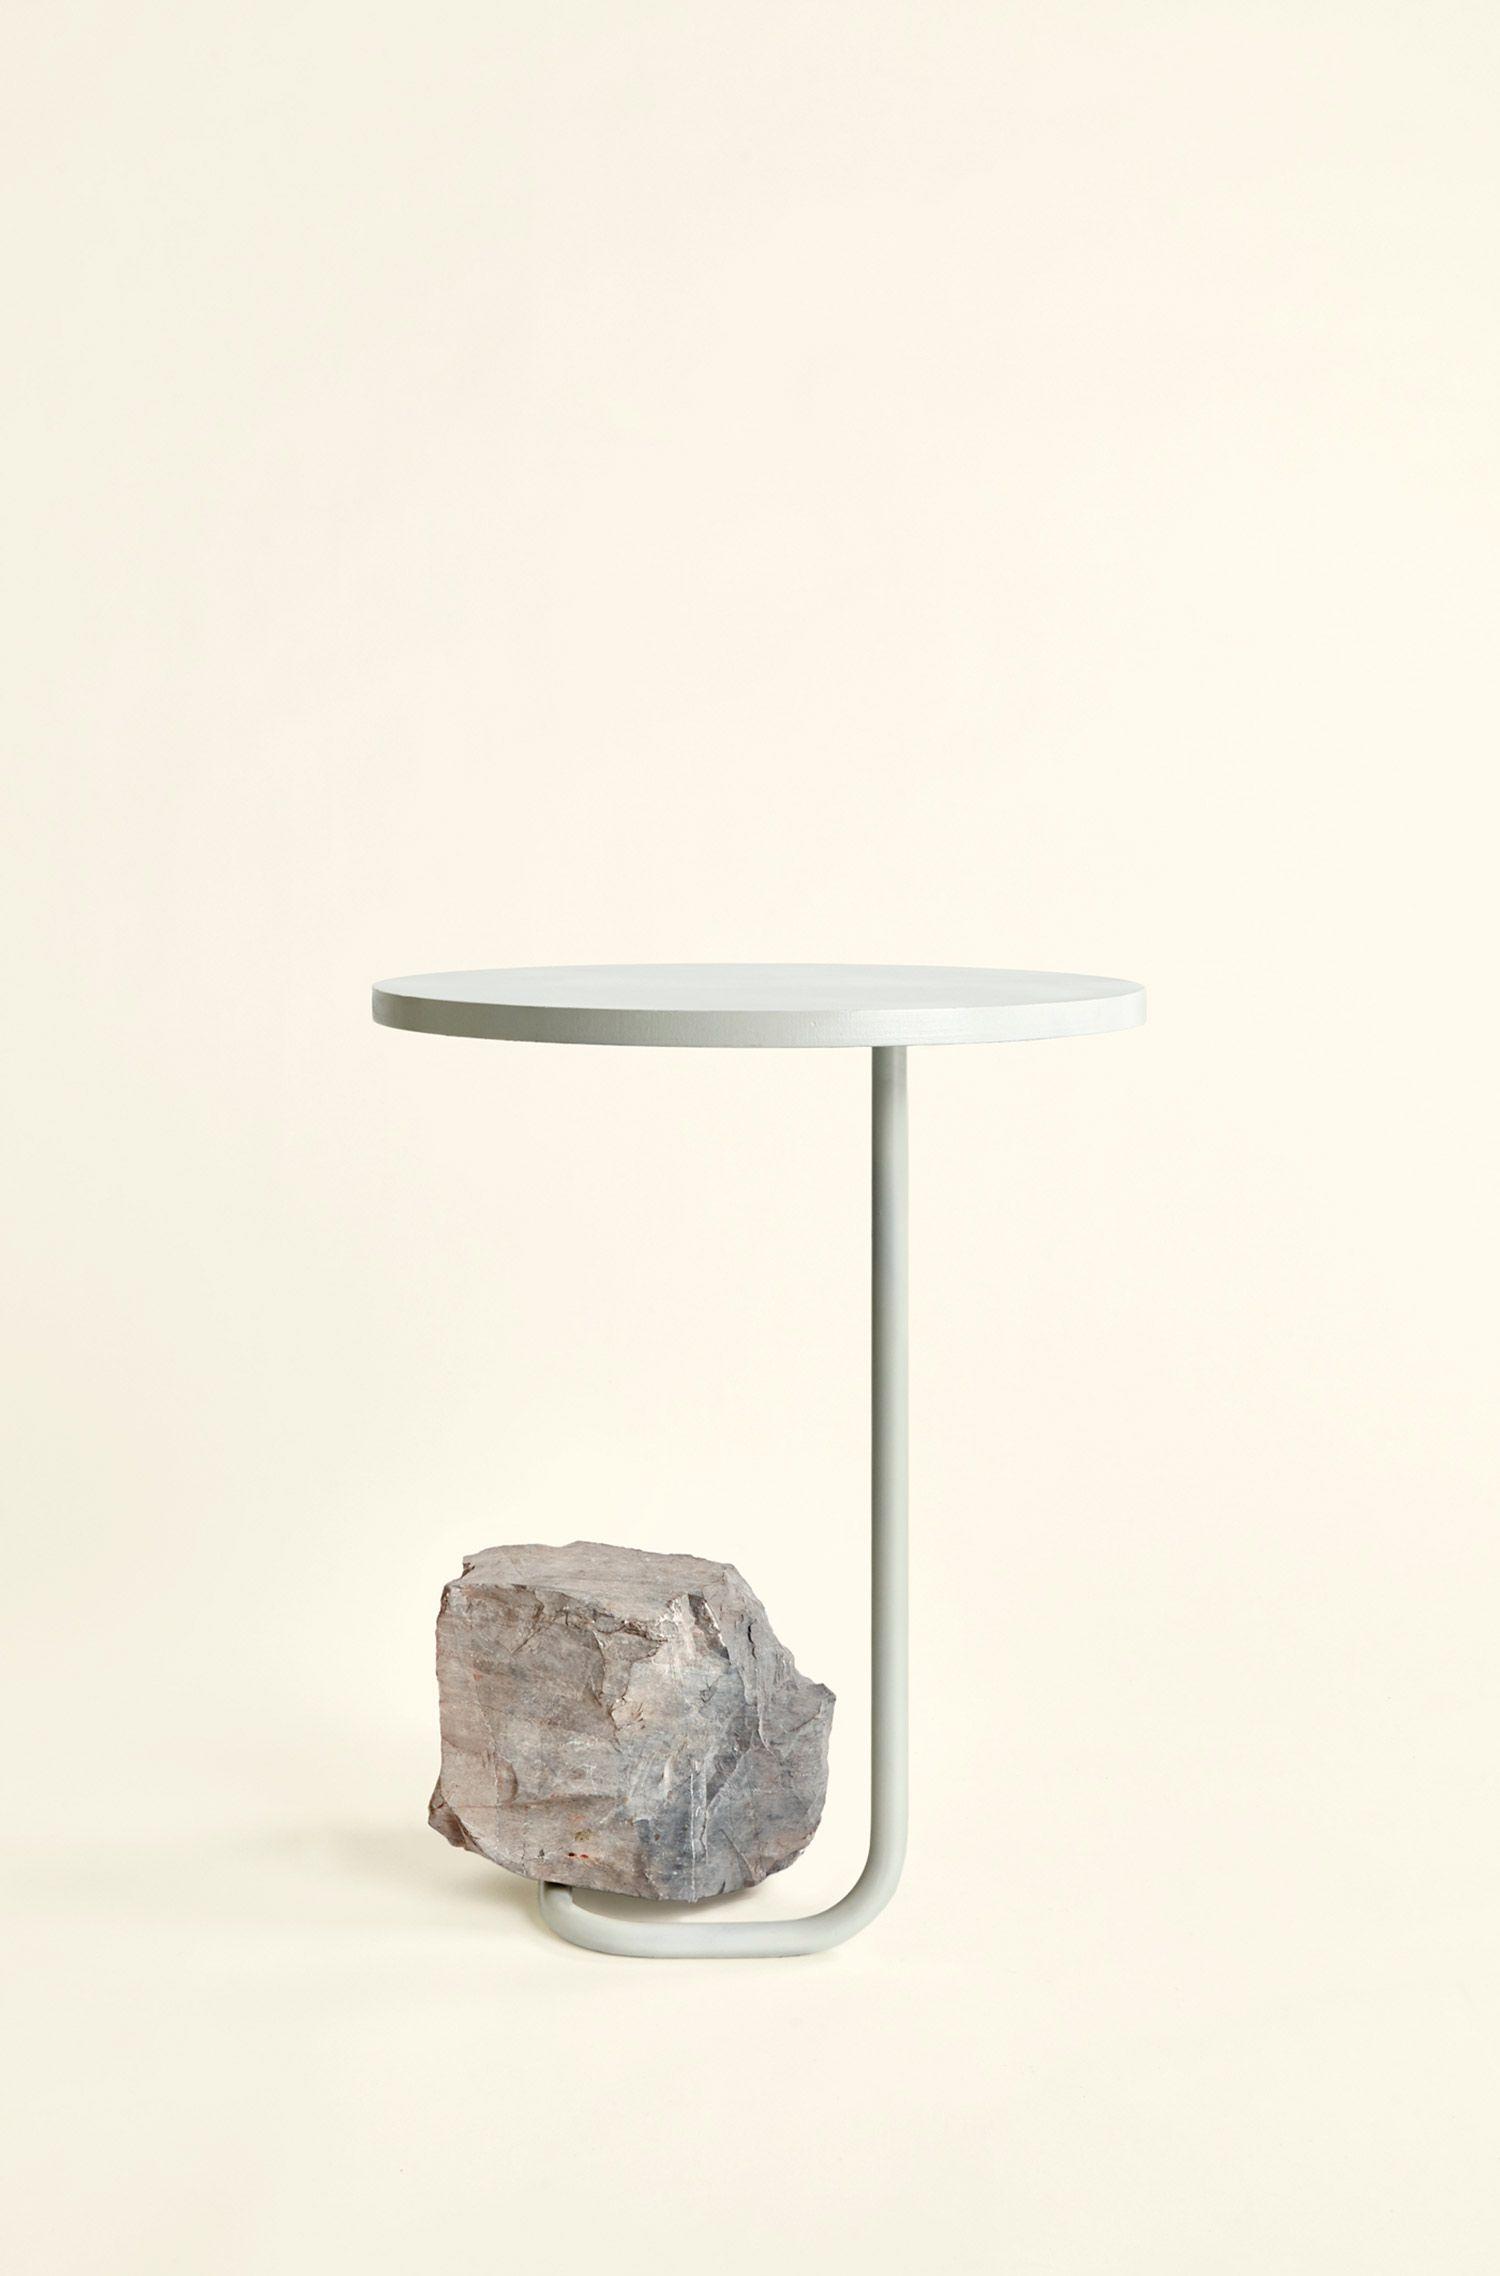 A Creative Italian Take On Product Design | Gessato Blog